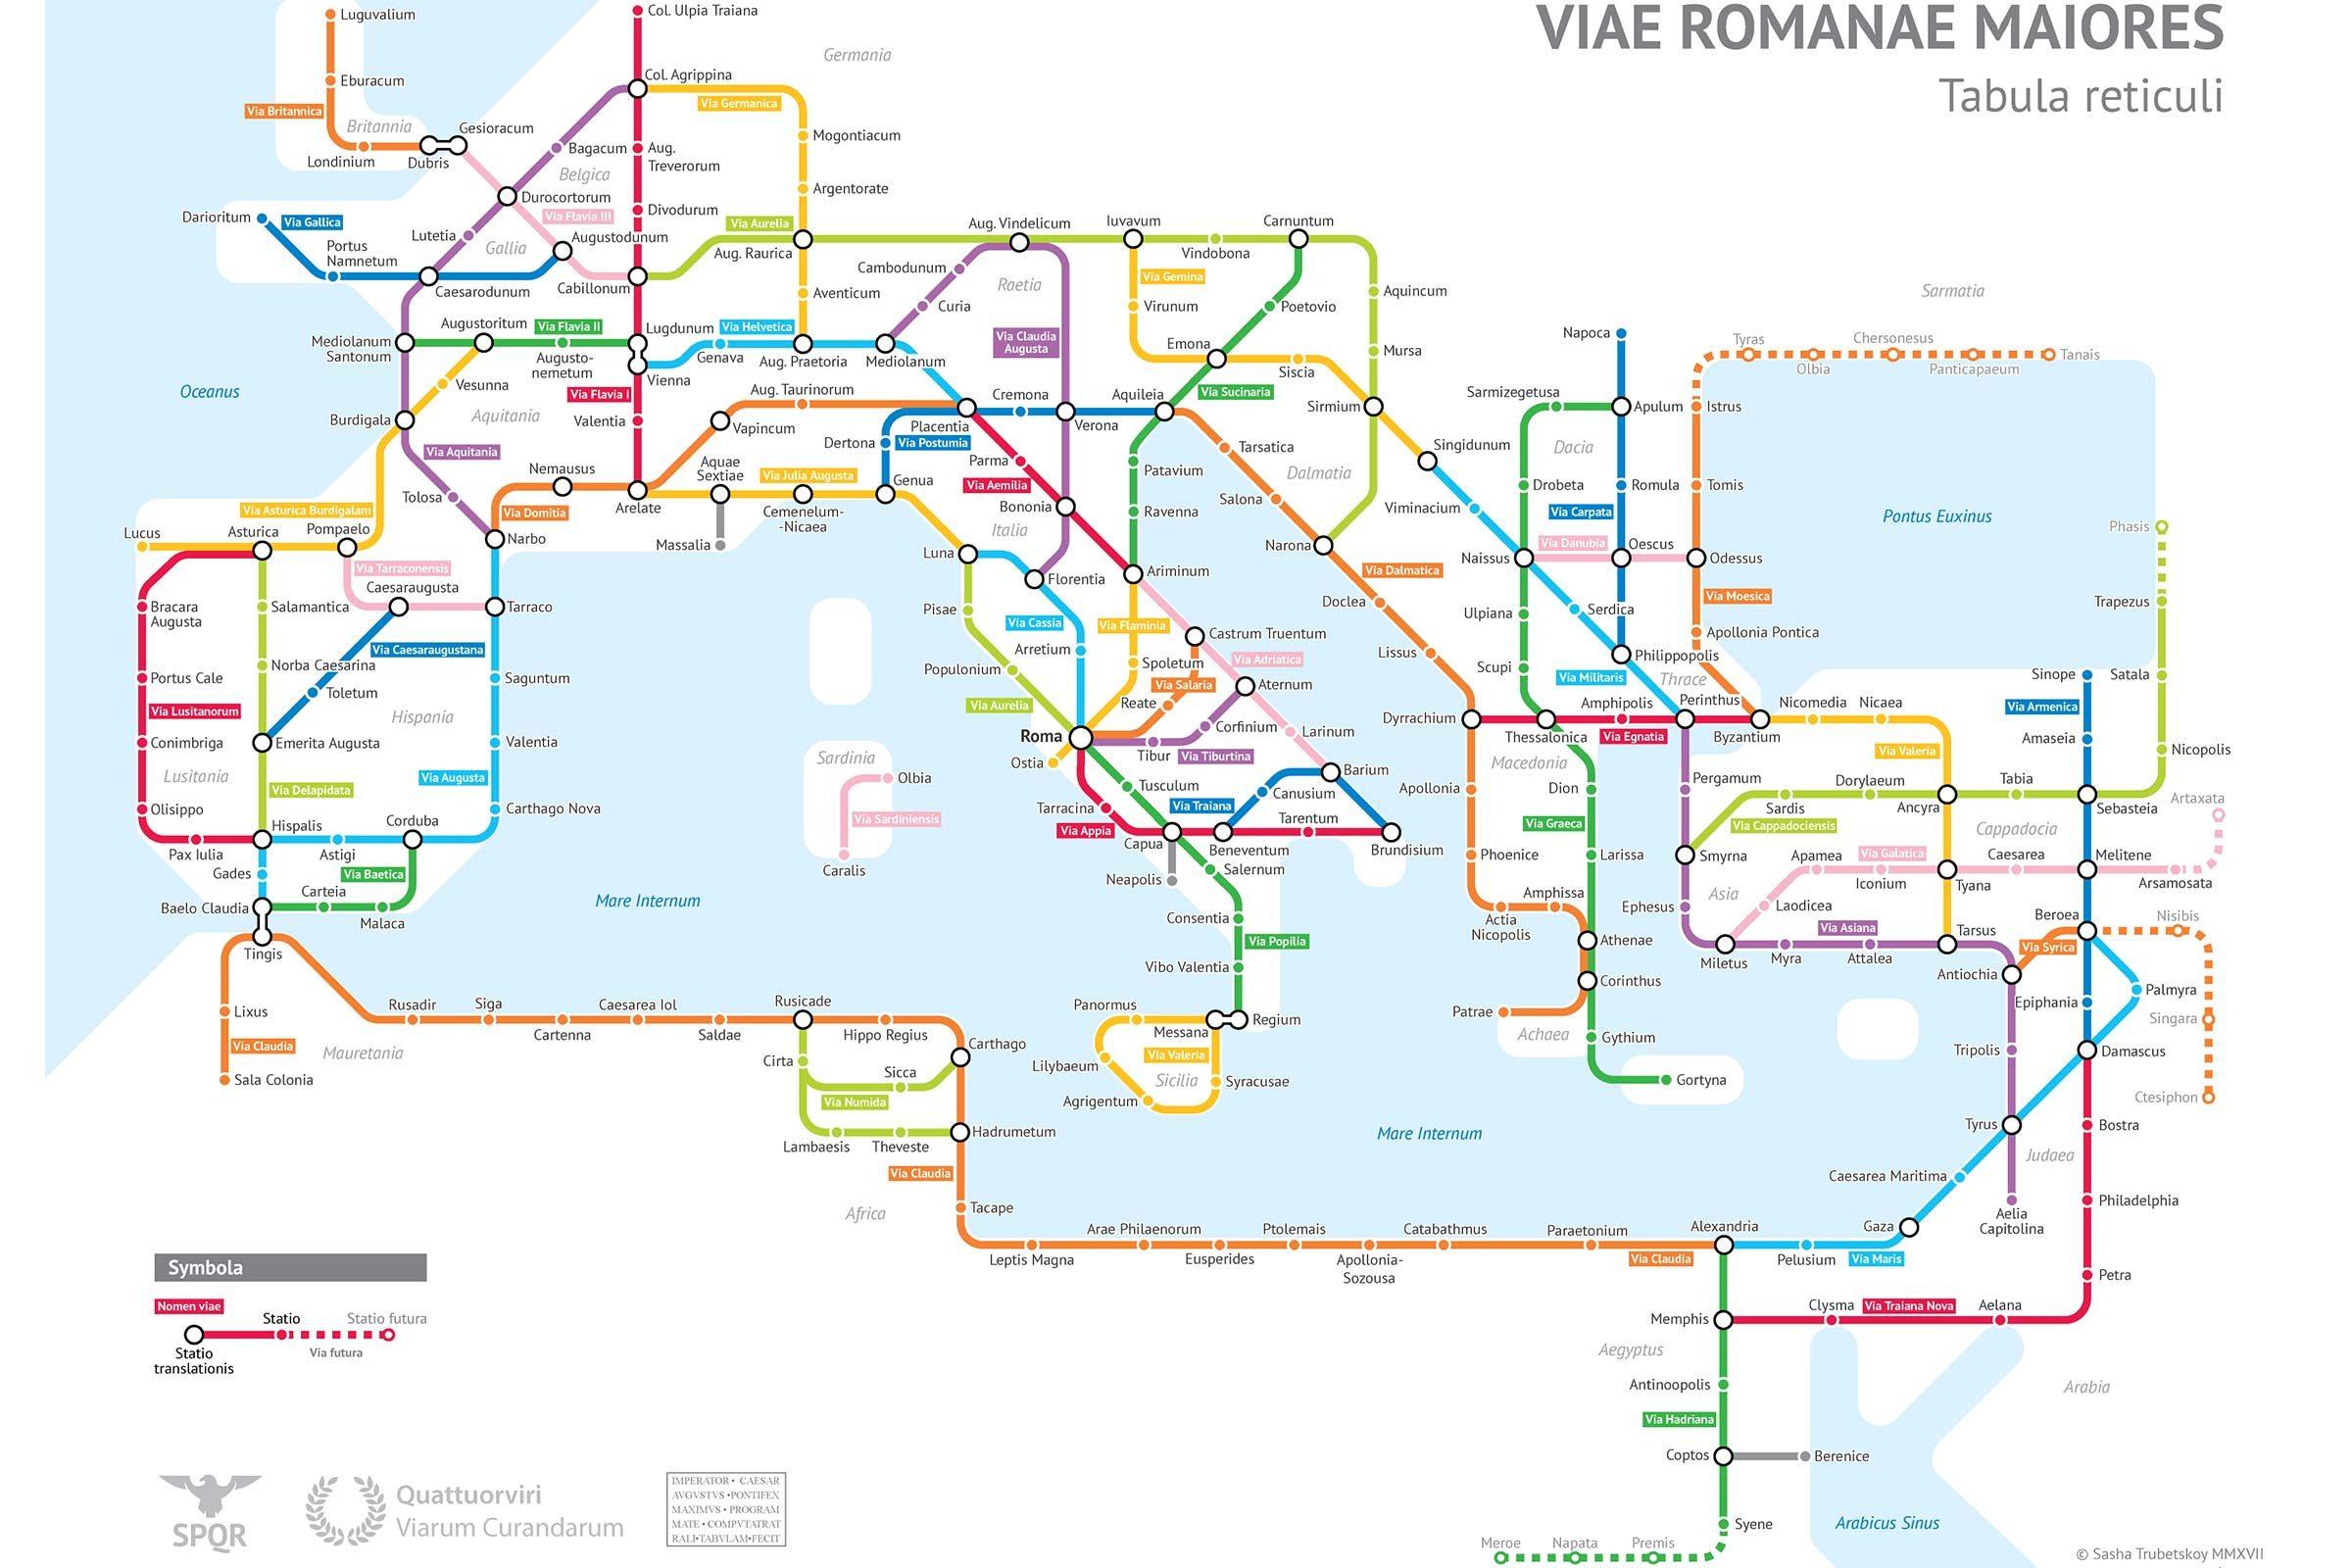 Carte des routes romaines - Courtoisie de Sasha Trubetskoy